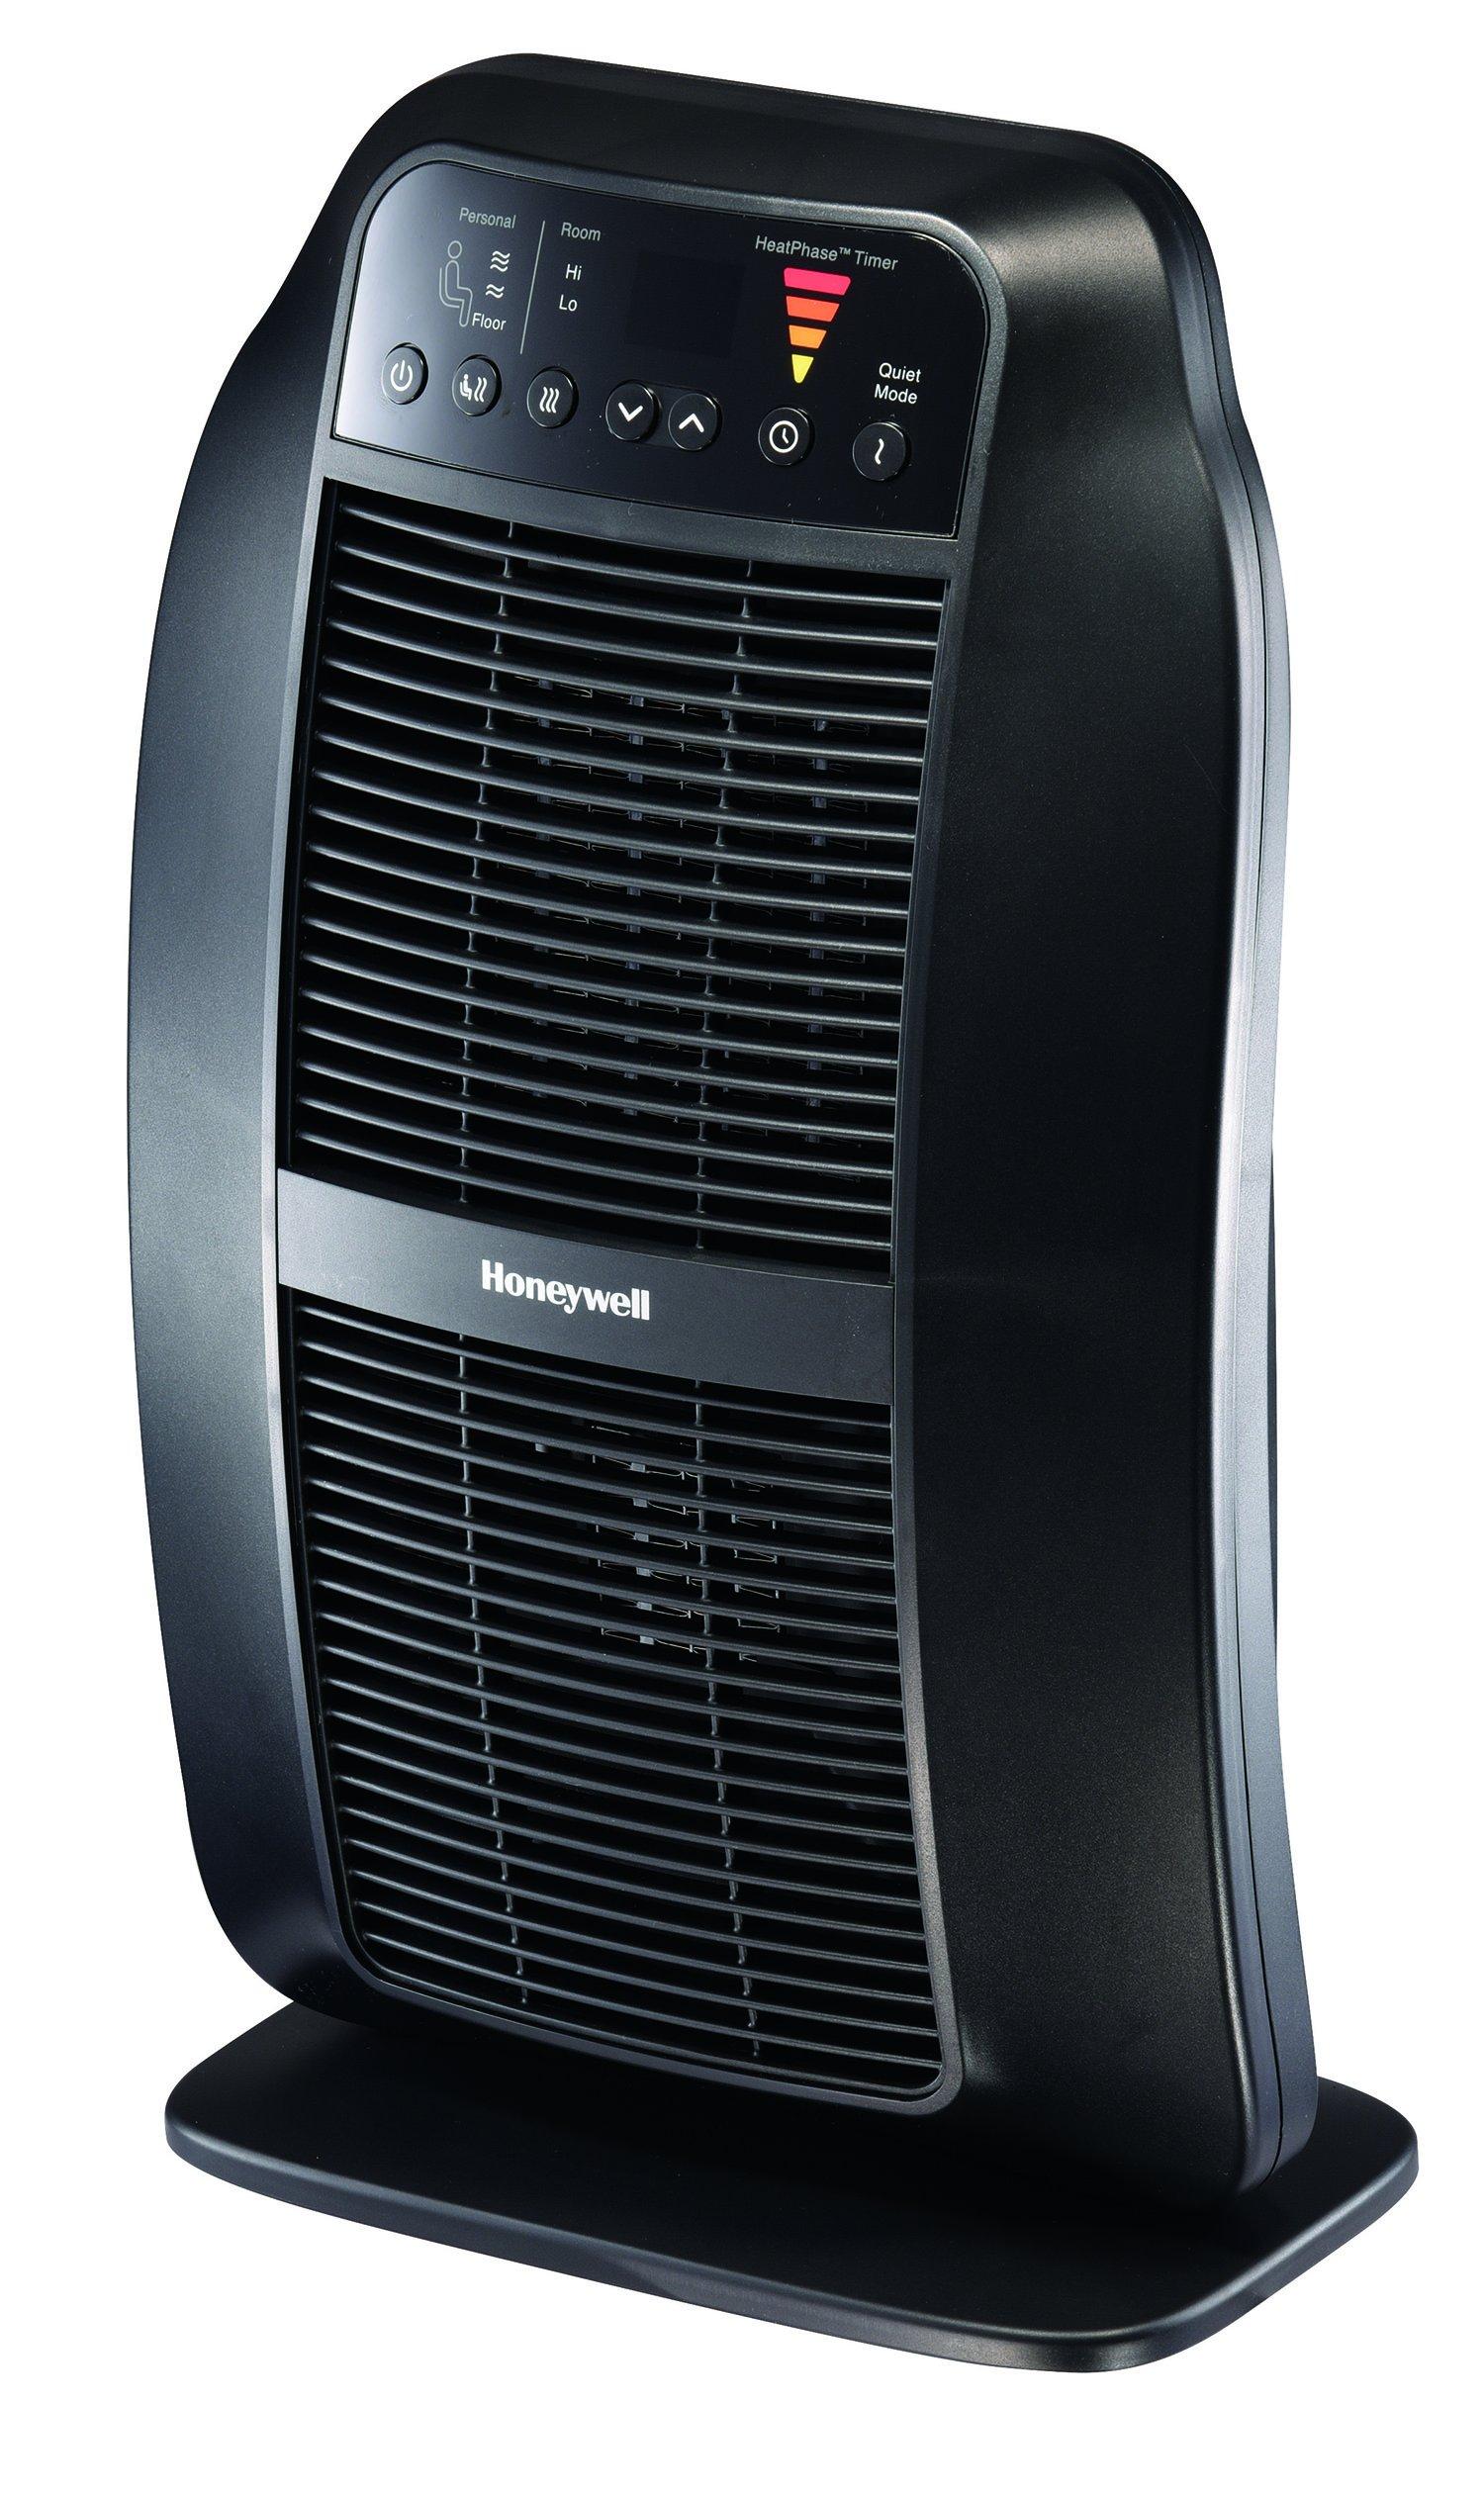 Honeywell HCE840B HeatGenius Ceramic Heater Black Energy Efficient 1500 Watt Custom Comfort with 6 Heat Settings, Quiet Mode & Auto-Off Heat Phase Timer for Home, School or Office by Honeywell